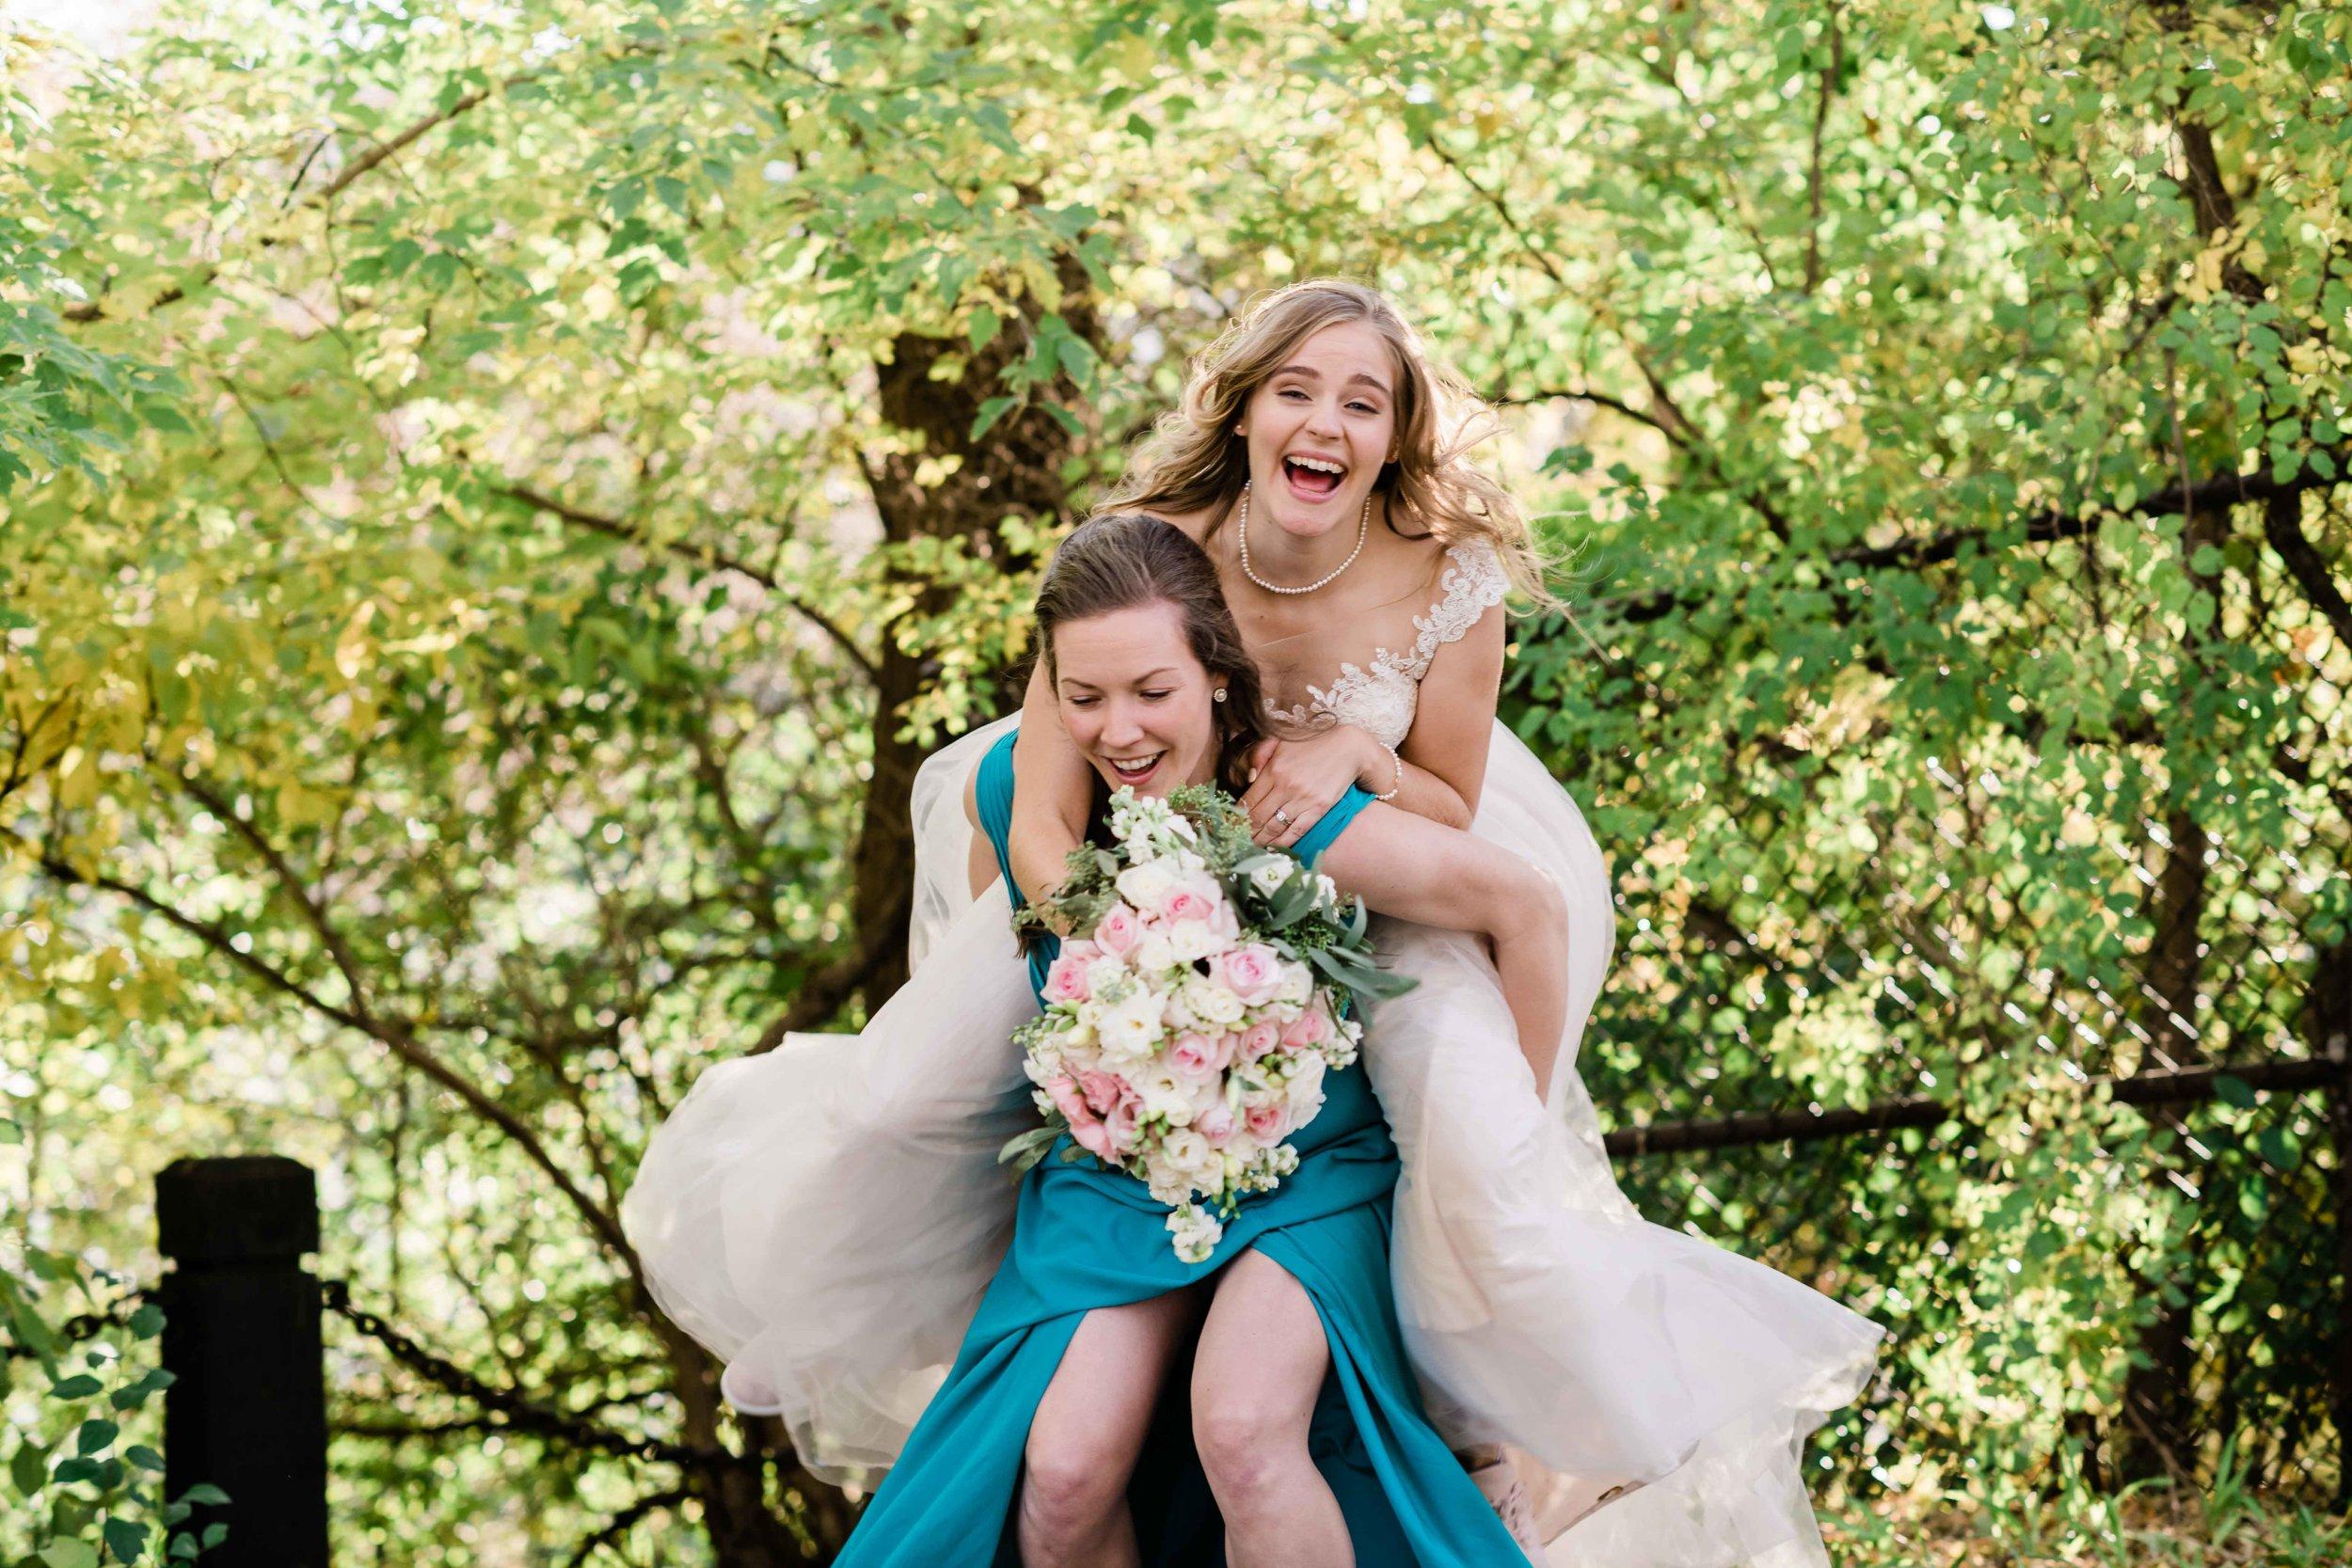 Bridesmaid gives bride piggy back ride